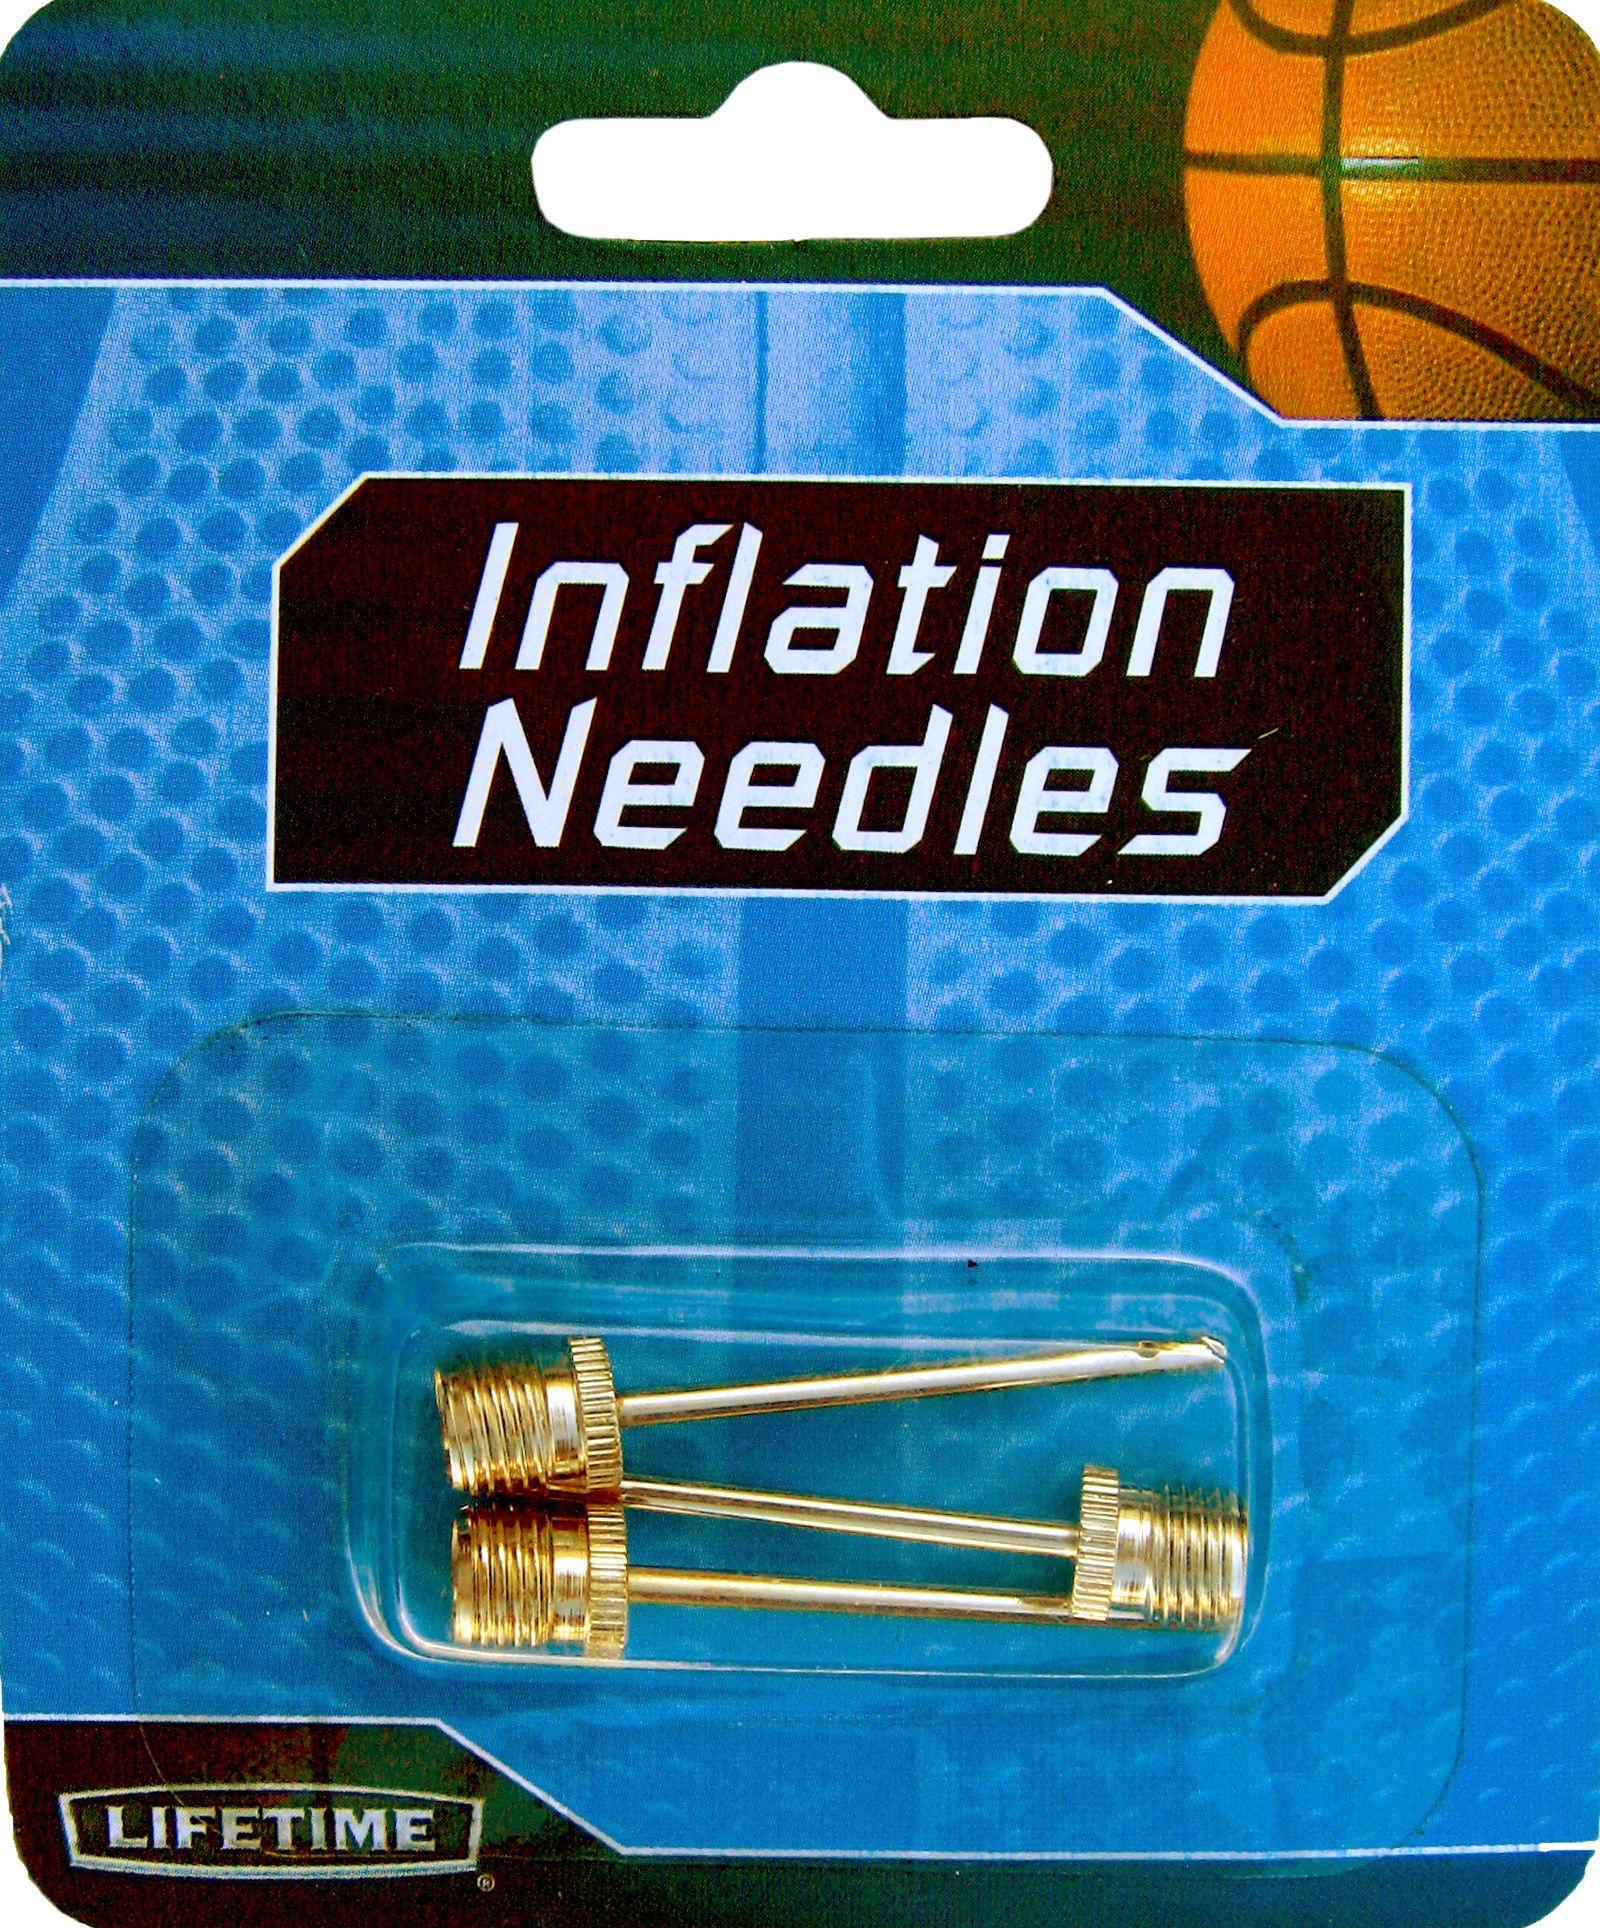 Lifetime 3 Pack Inflation Needles DICKS Sporting Goods